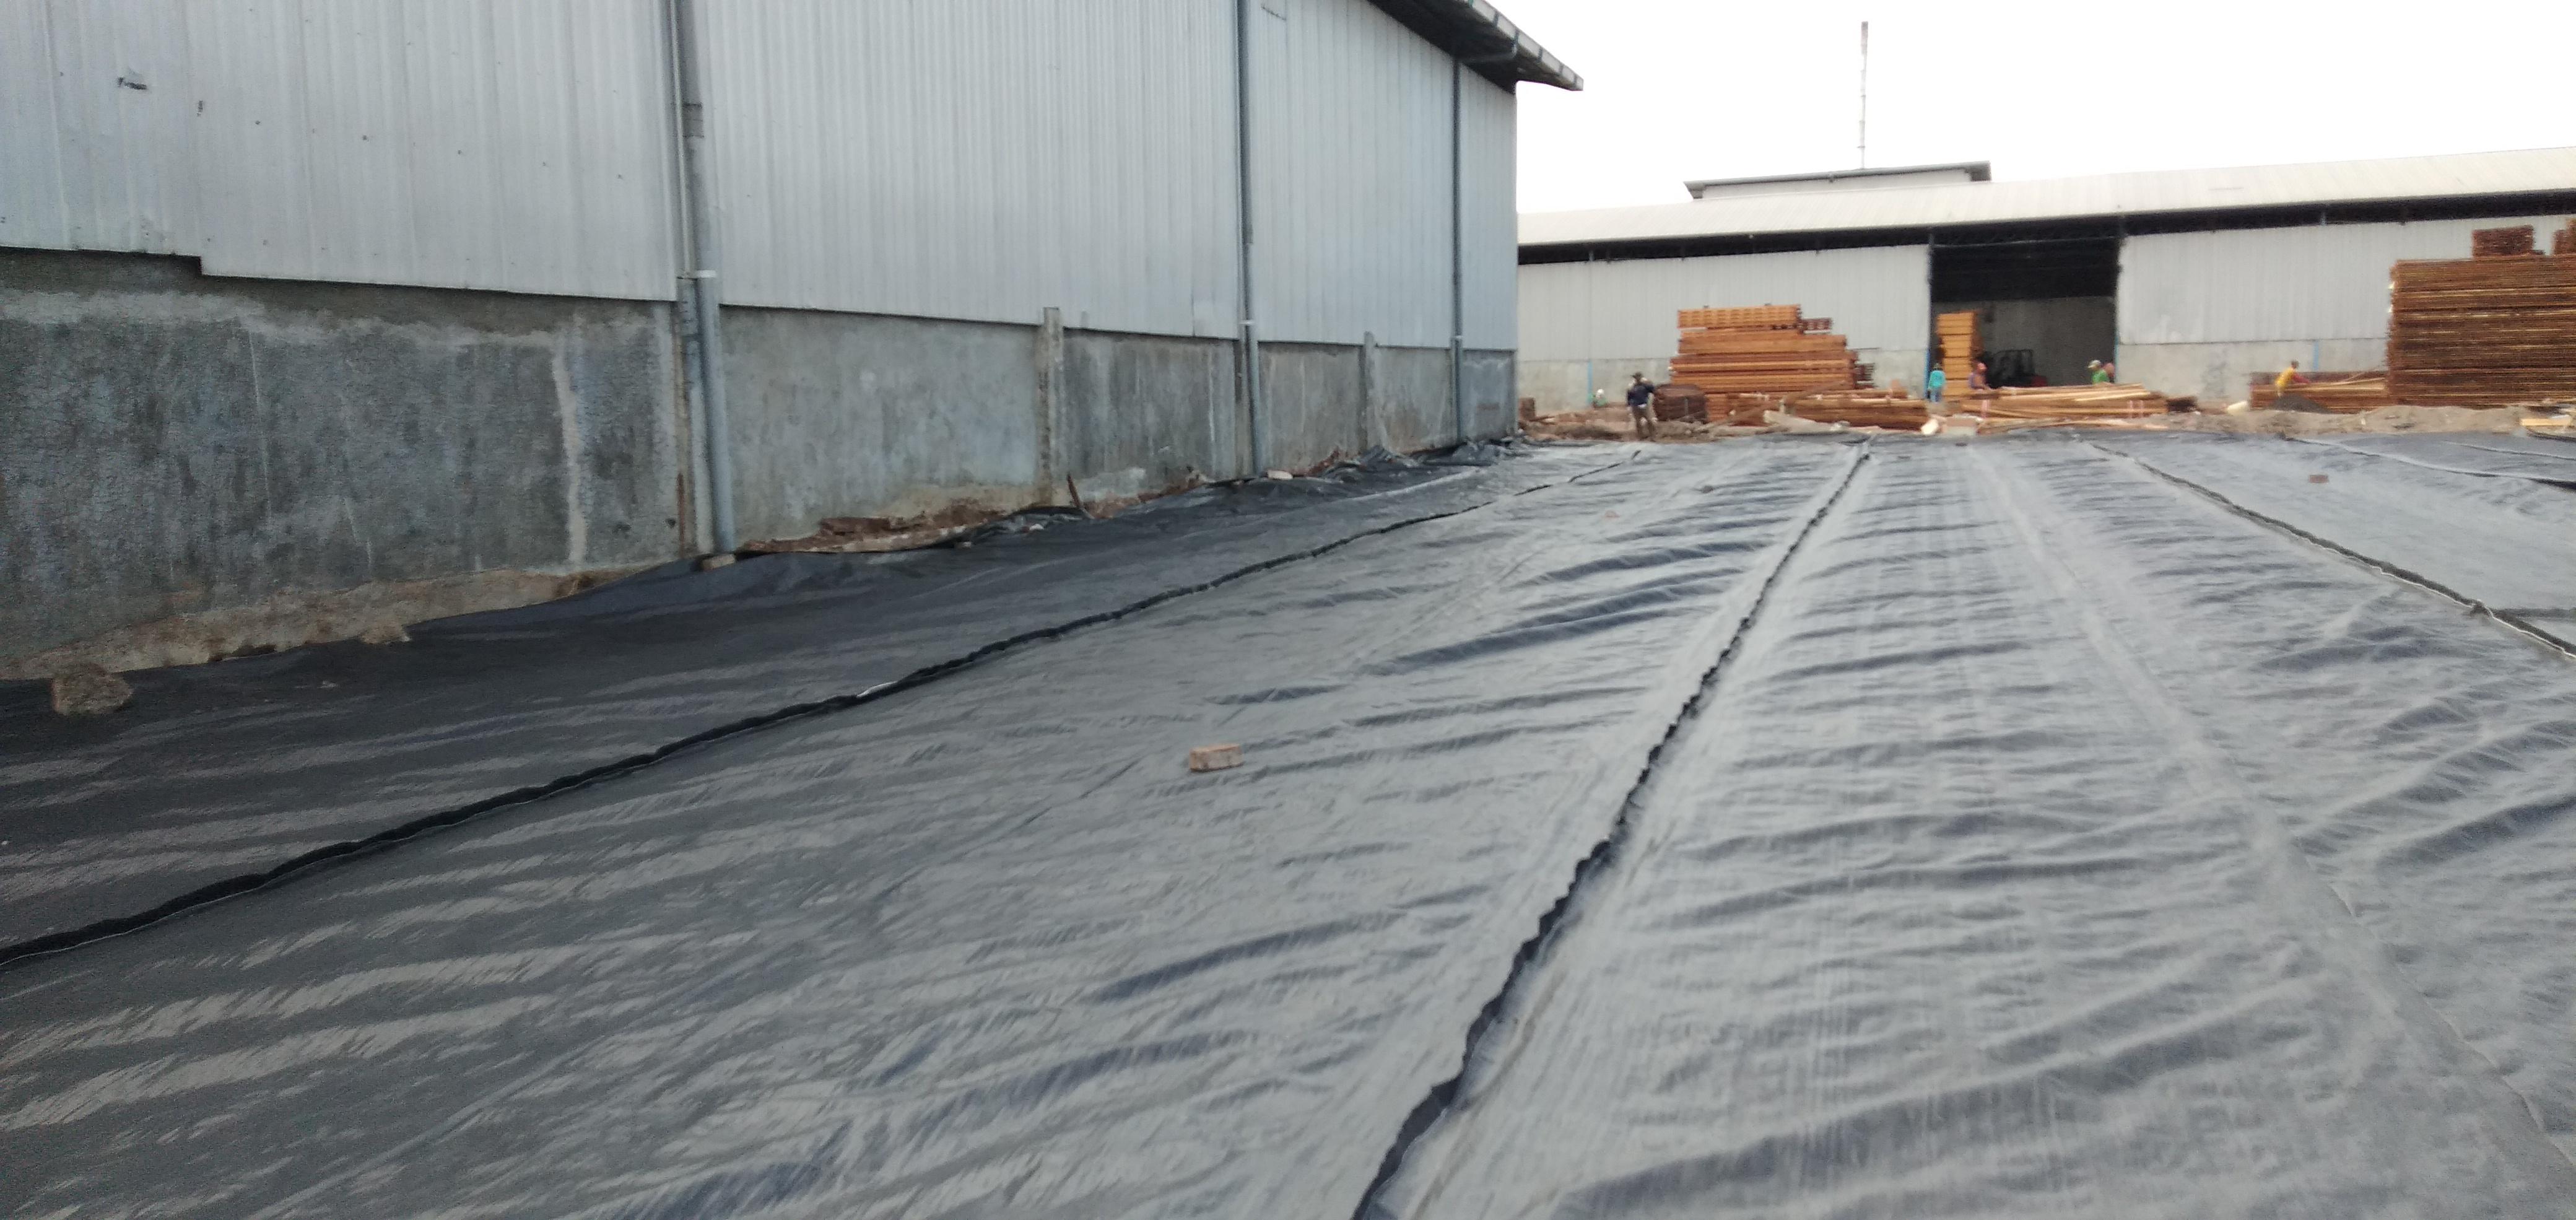 Geotextile Nonwoven Work - Warehouse Reinforcement